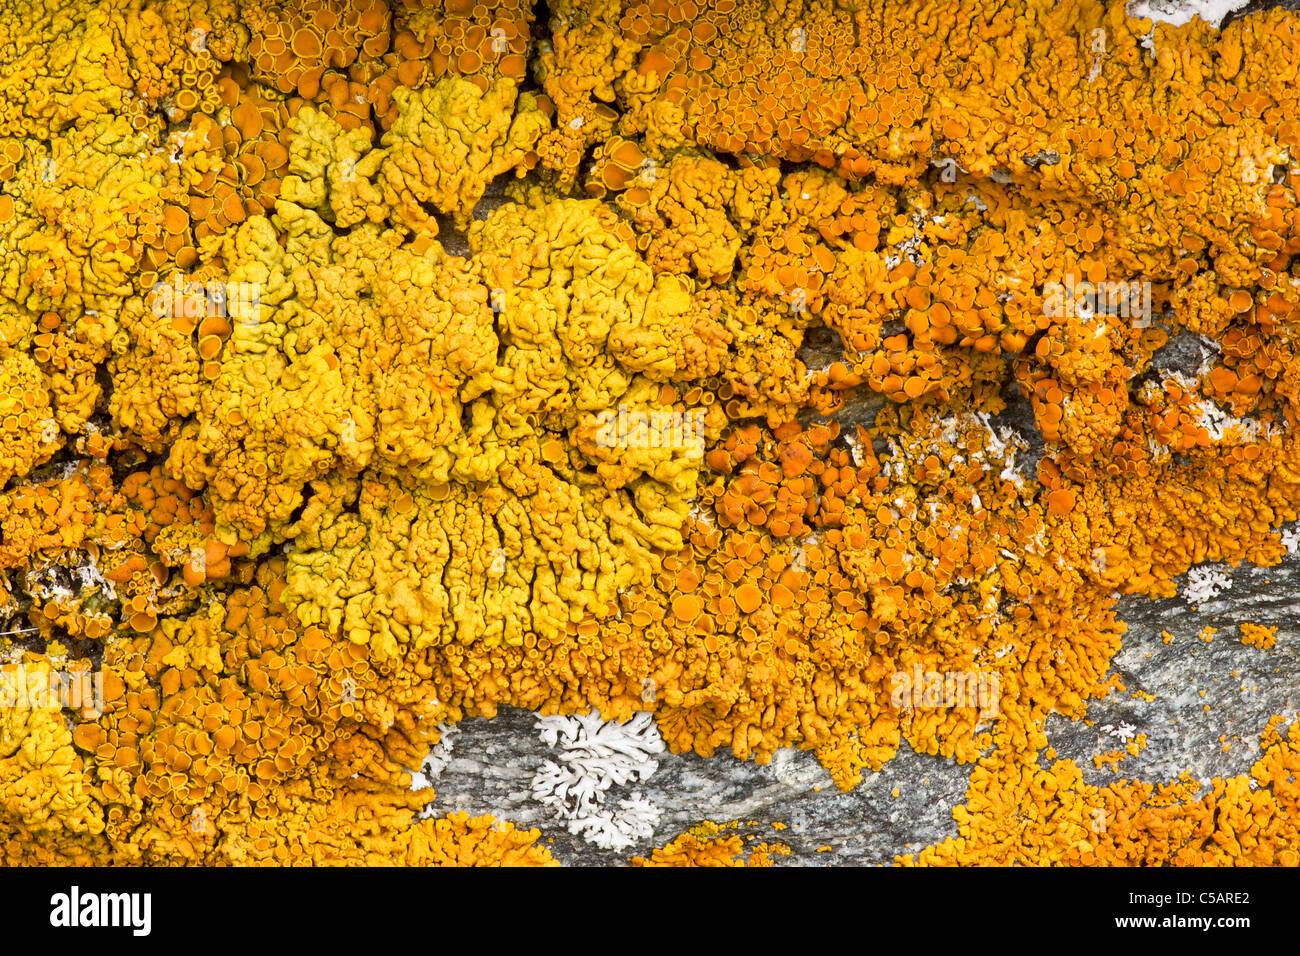 A crustose lichen, probably Caloplaca species, Valgrisenche, Italian Alps. - Stock Image